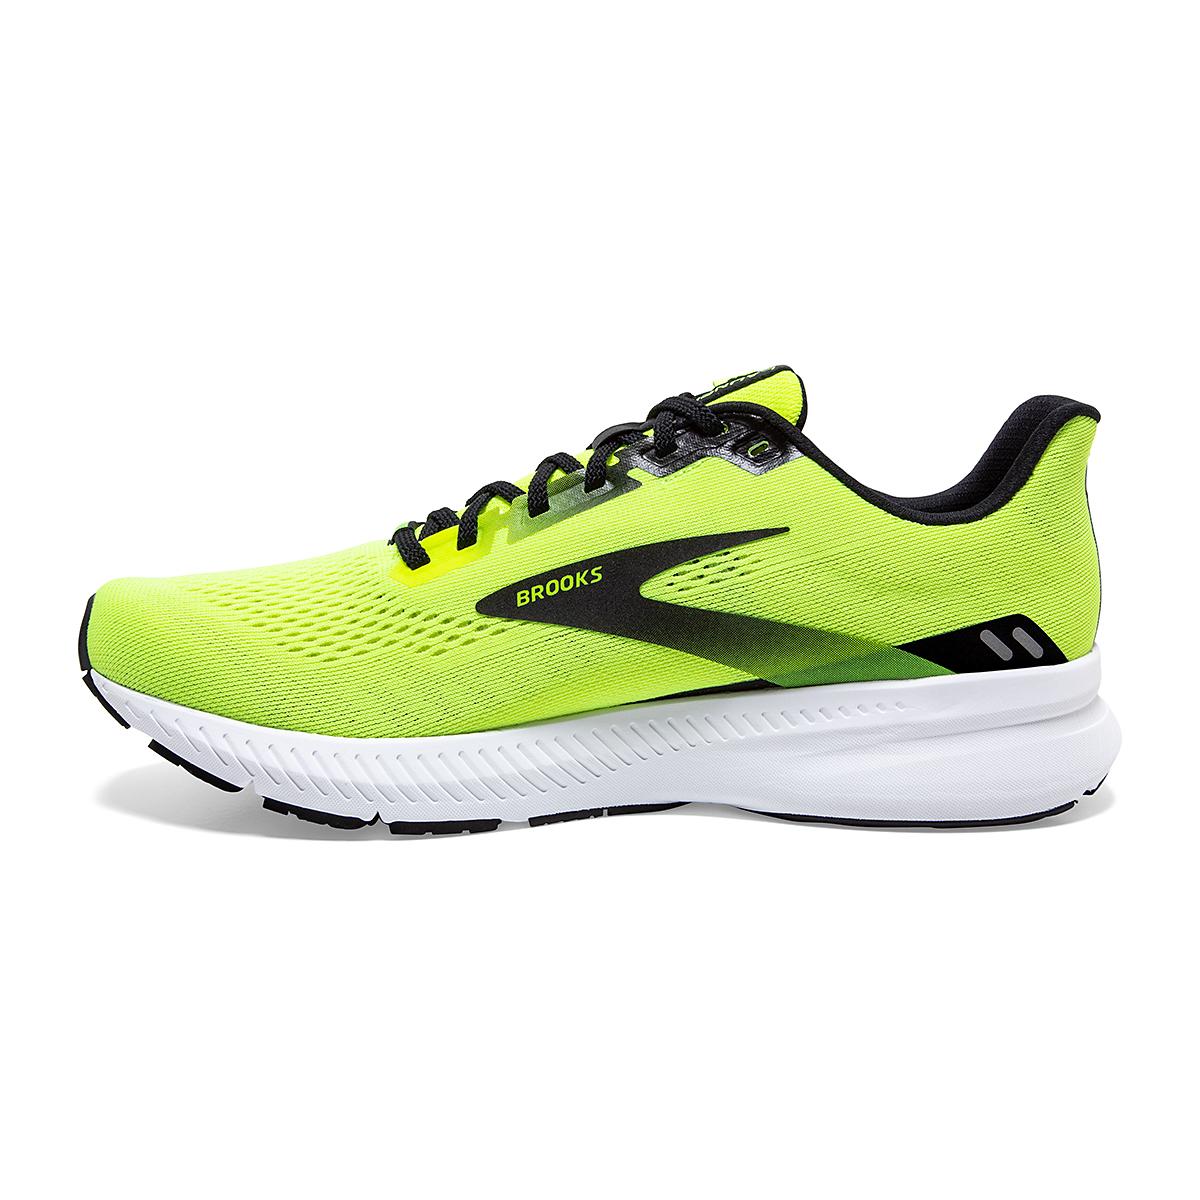 Men's Brooks Launch 8 Running Shoe - Color: Nightlife/Black/White - Size: 7 - Width: Regular, Nightlife/Black/White, large, image 4